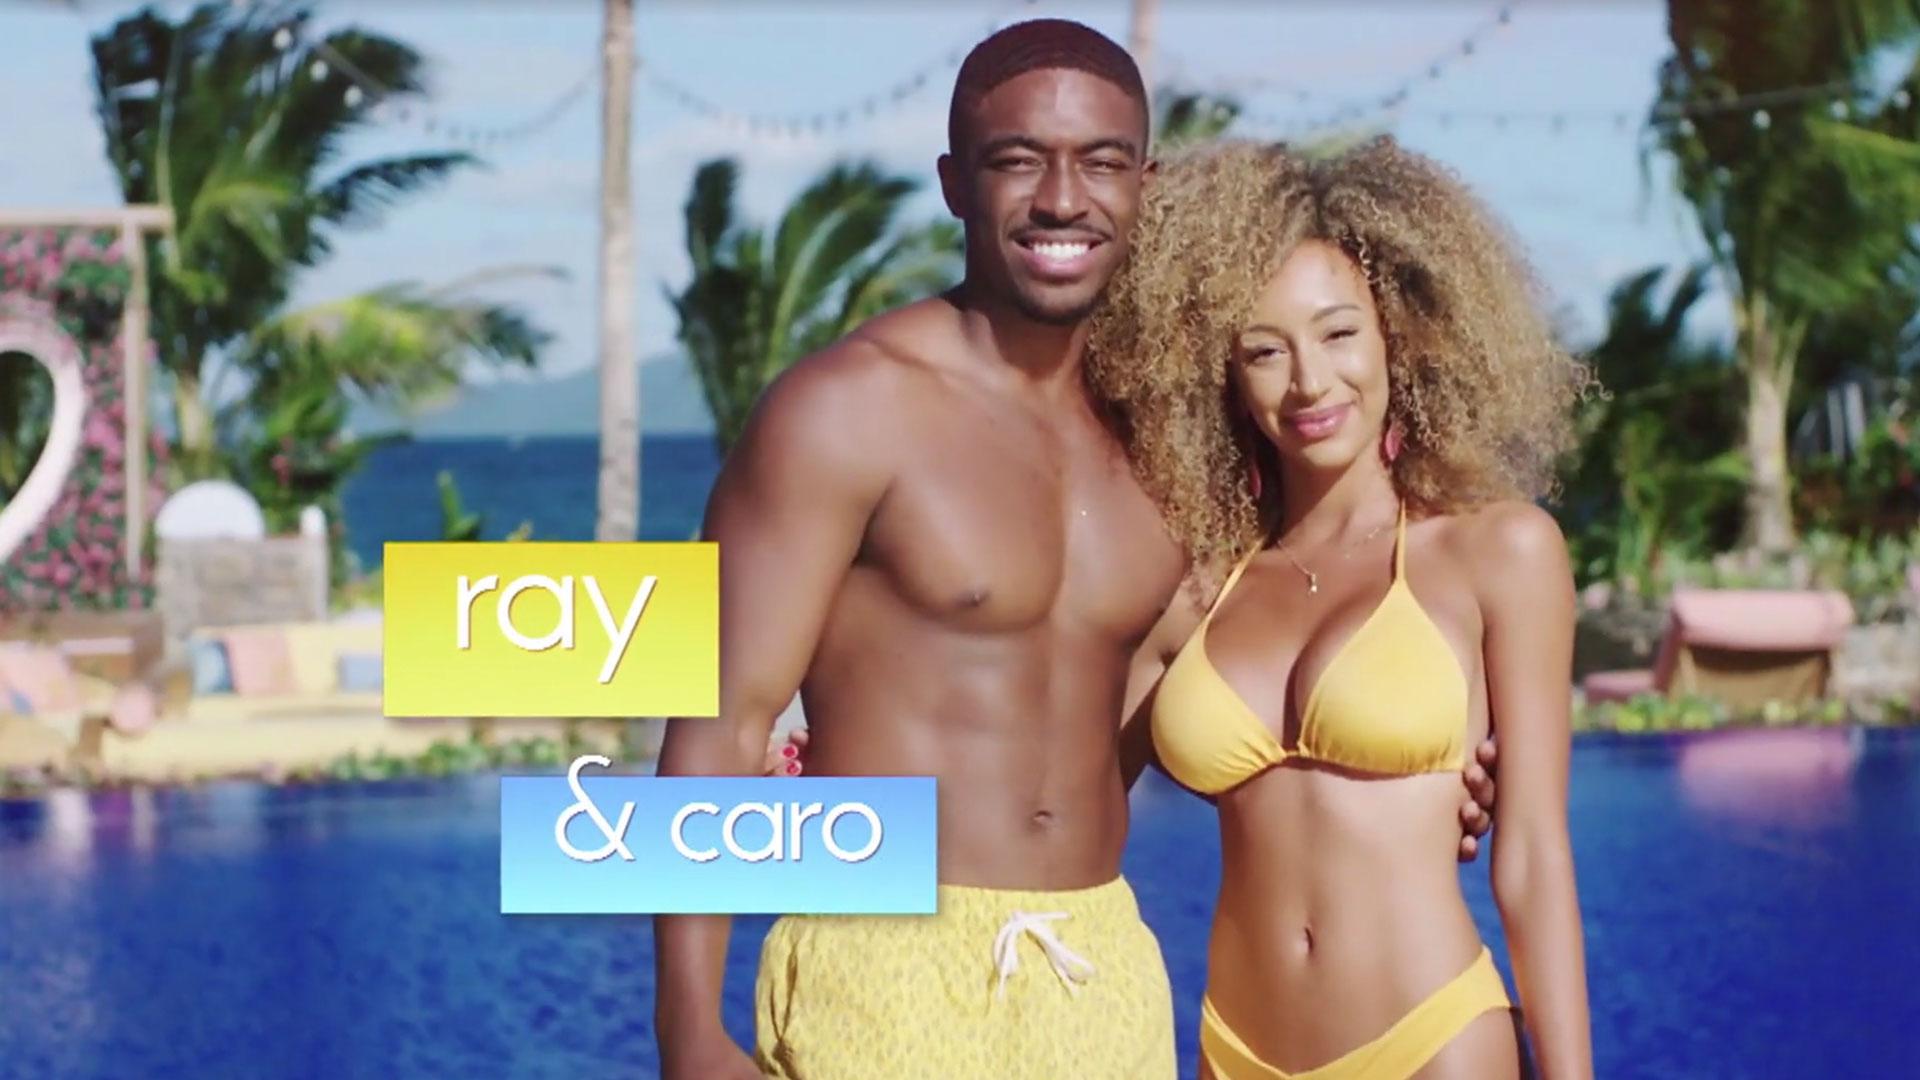 Ray and Caro